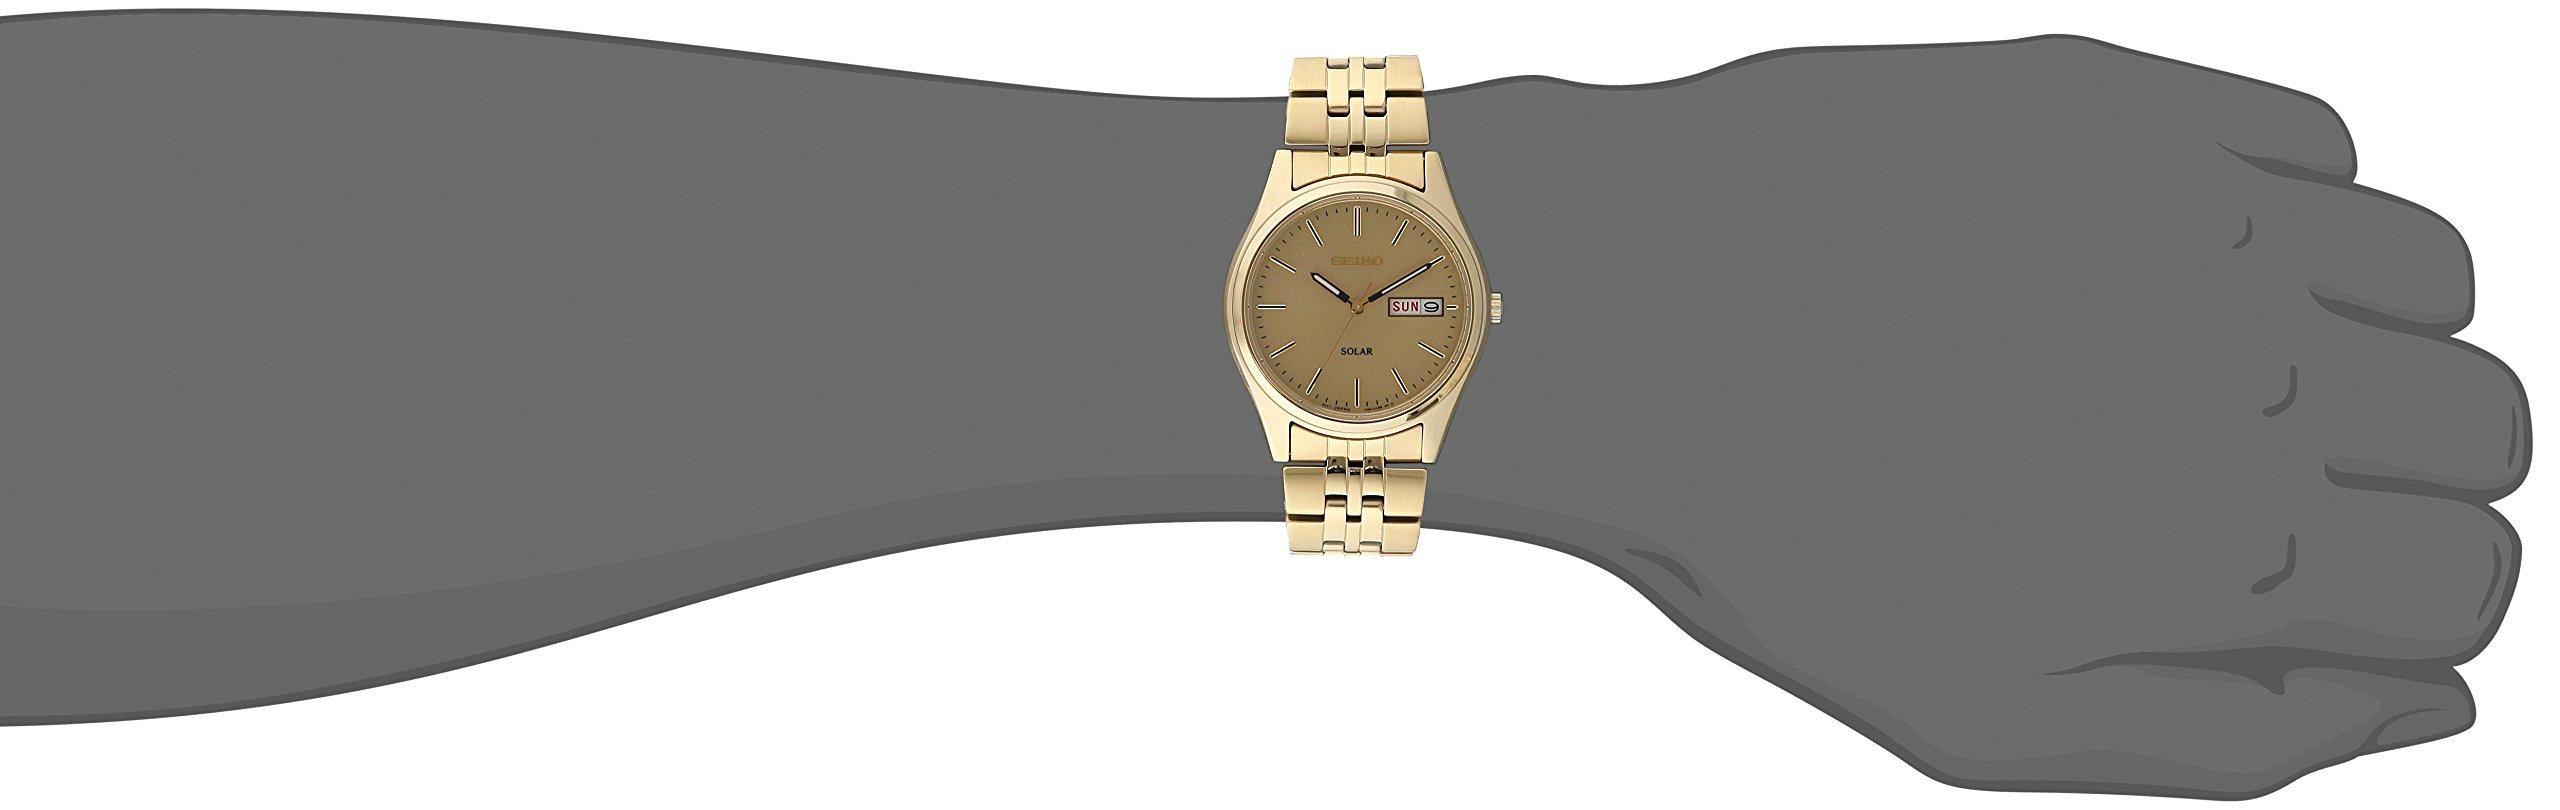 Seiko Men's SNE036 Stainless Steel Solar Watch